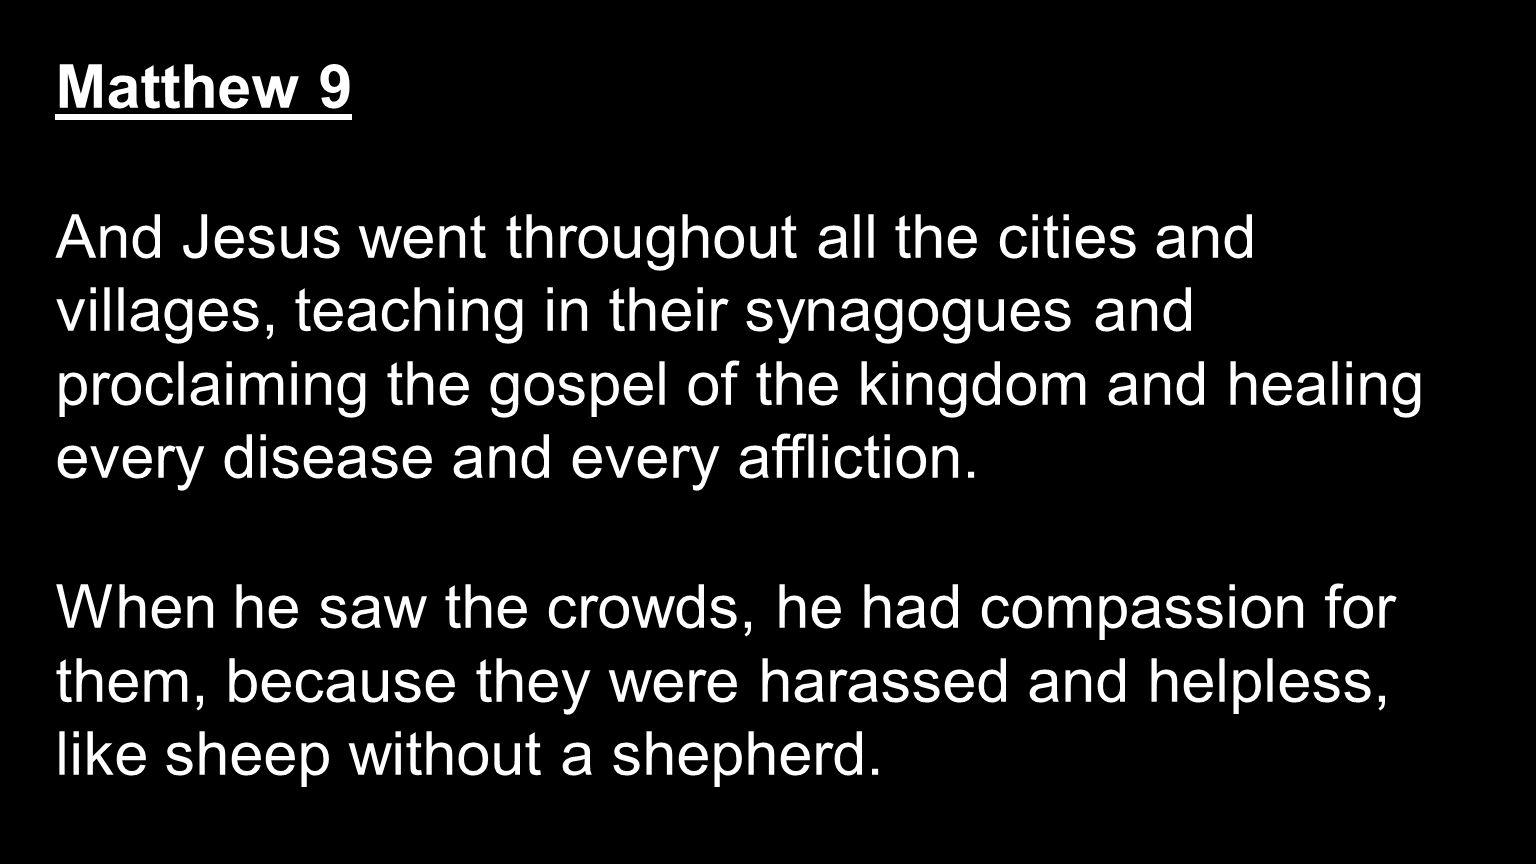 Matthew 9